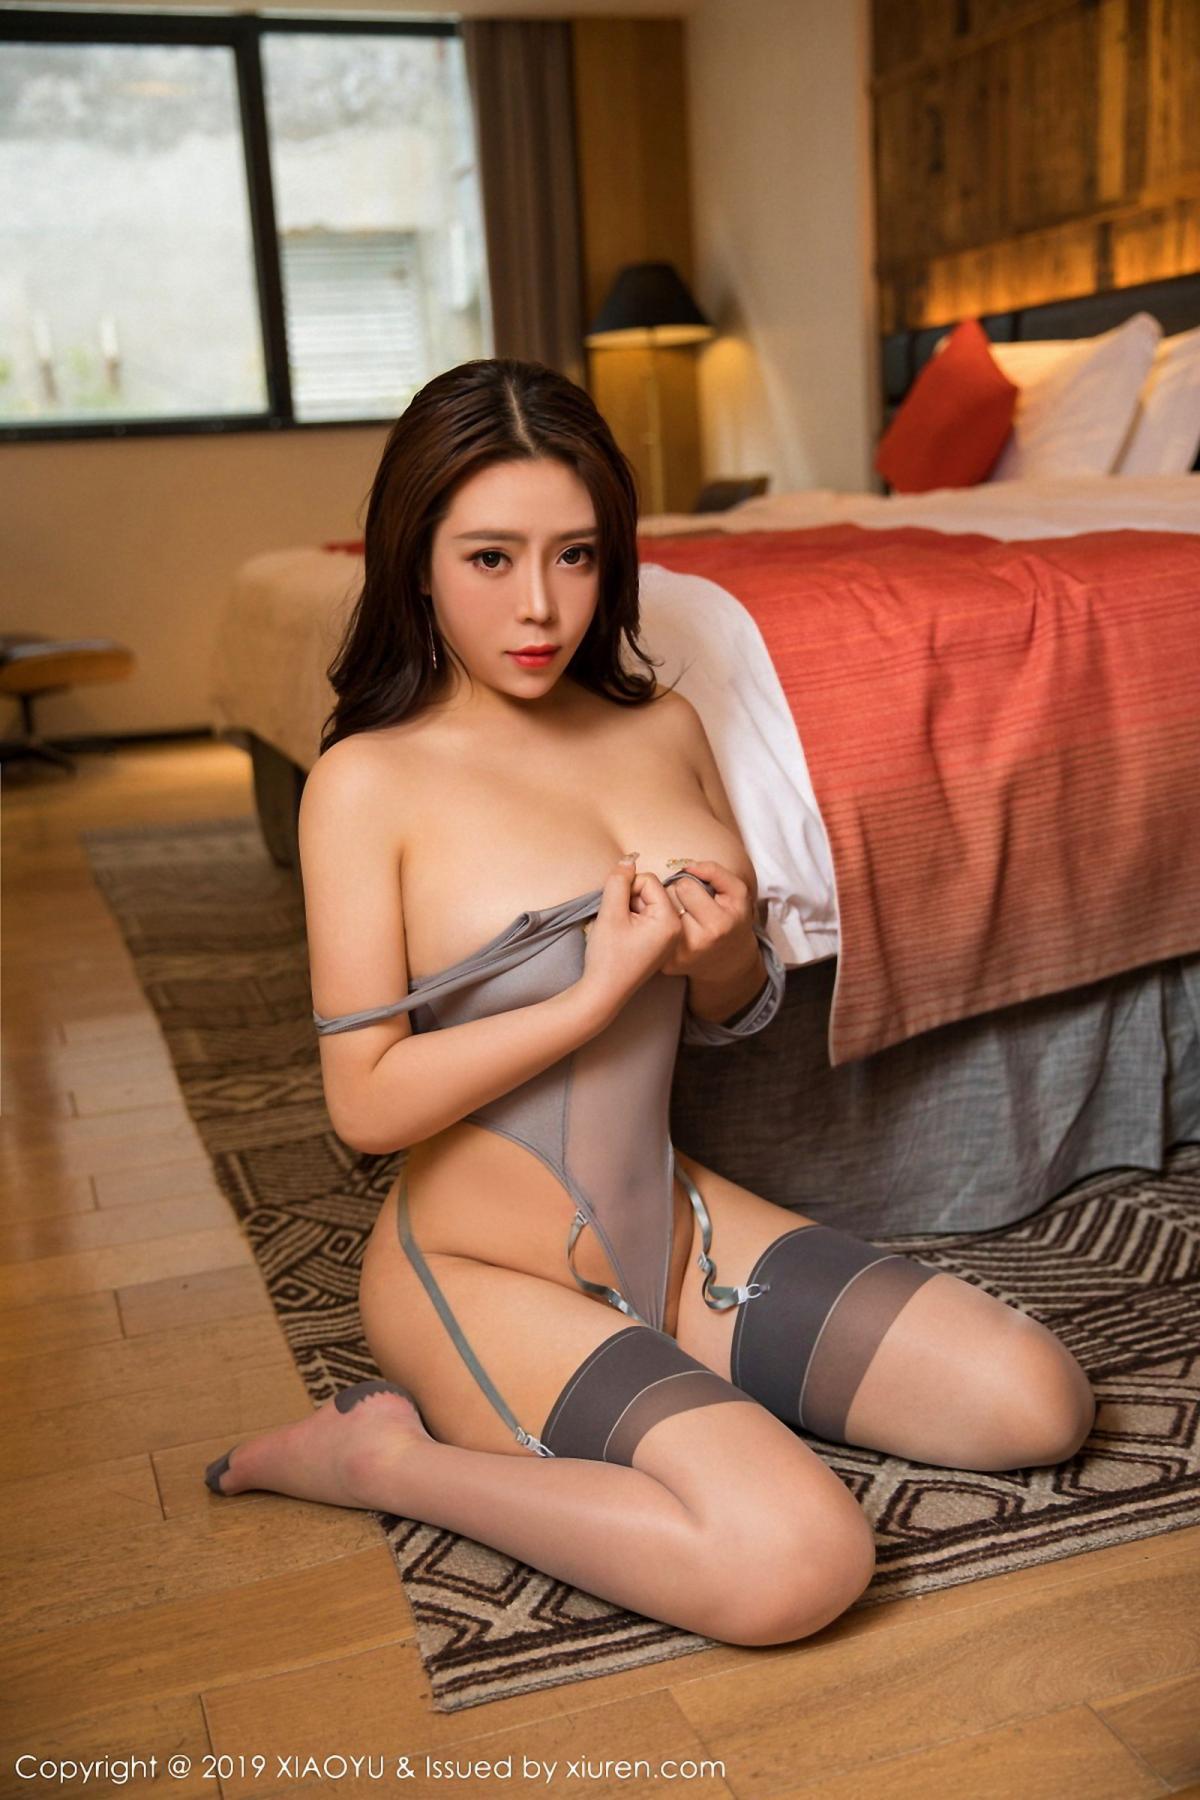 [XiaoYu] Vol.038 Miki Tu 26P, Miki Tu, XiaoYu